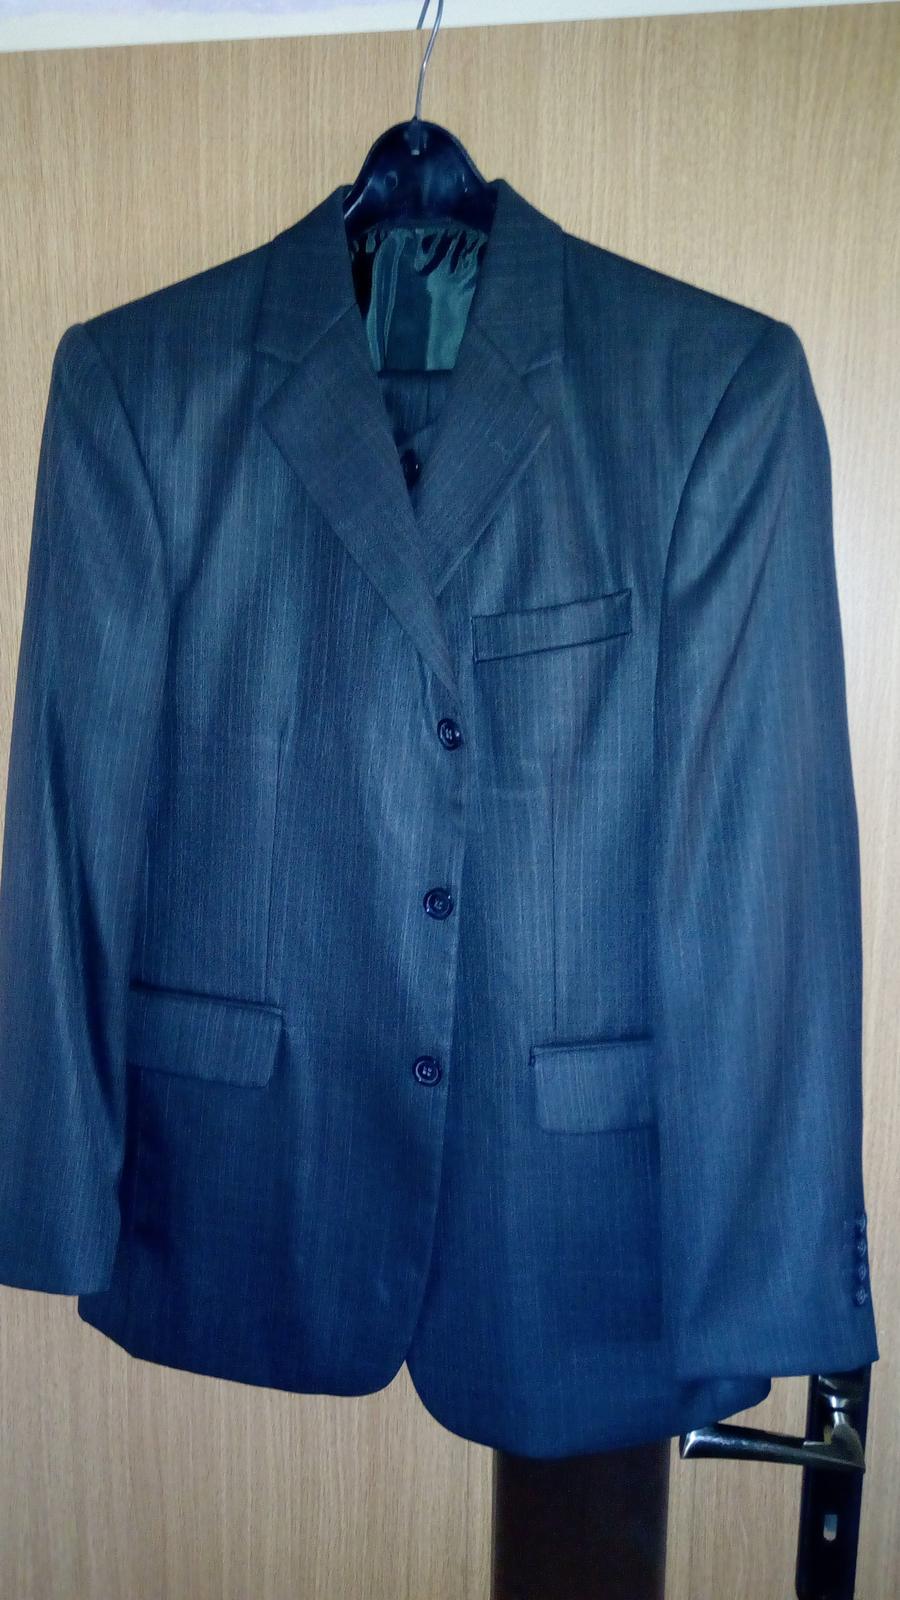 Sivý svadobný oblek s vestou - Obrázok č. 1